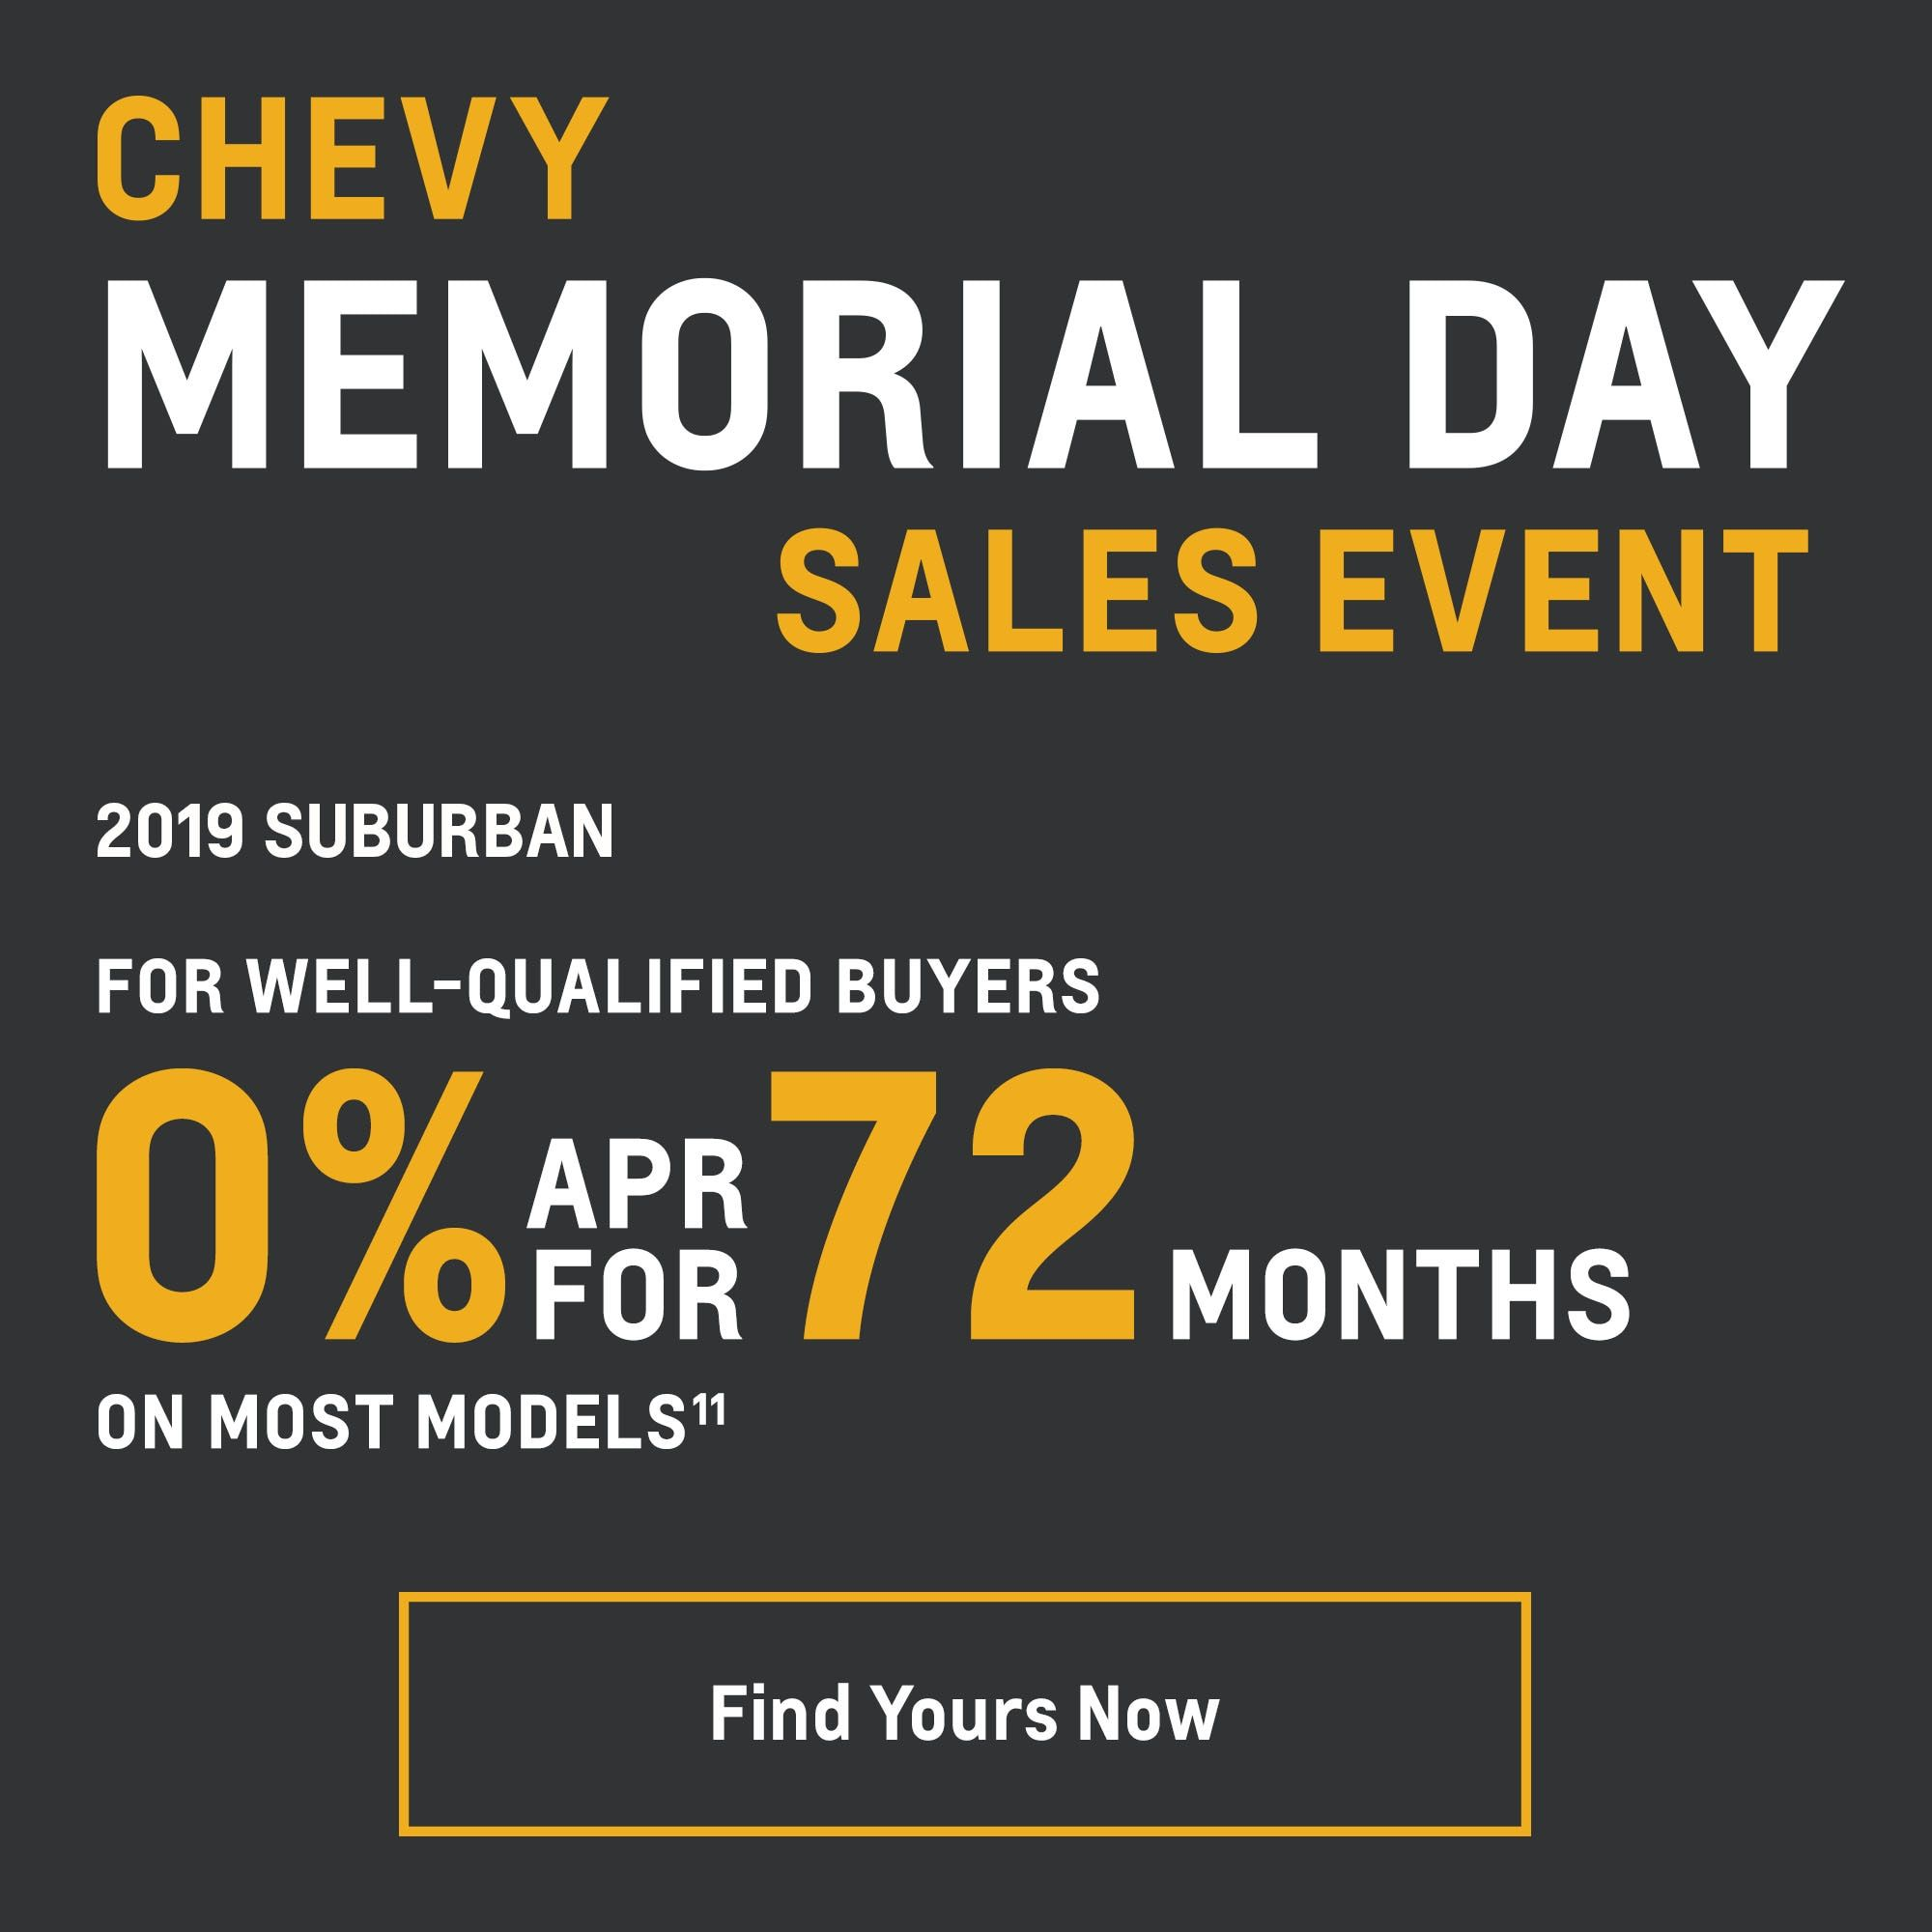 Current Chevy Deals Offers New Car Deals New Cars Car Deals Chevy